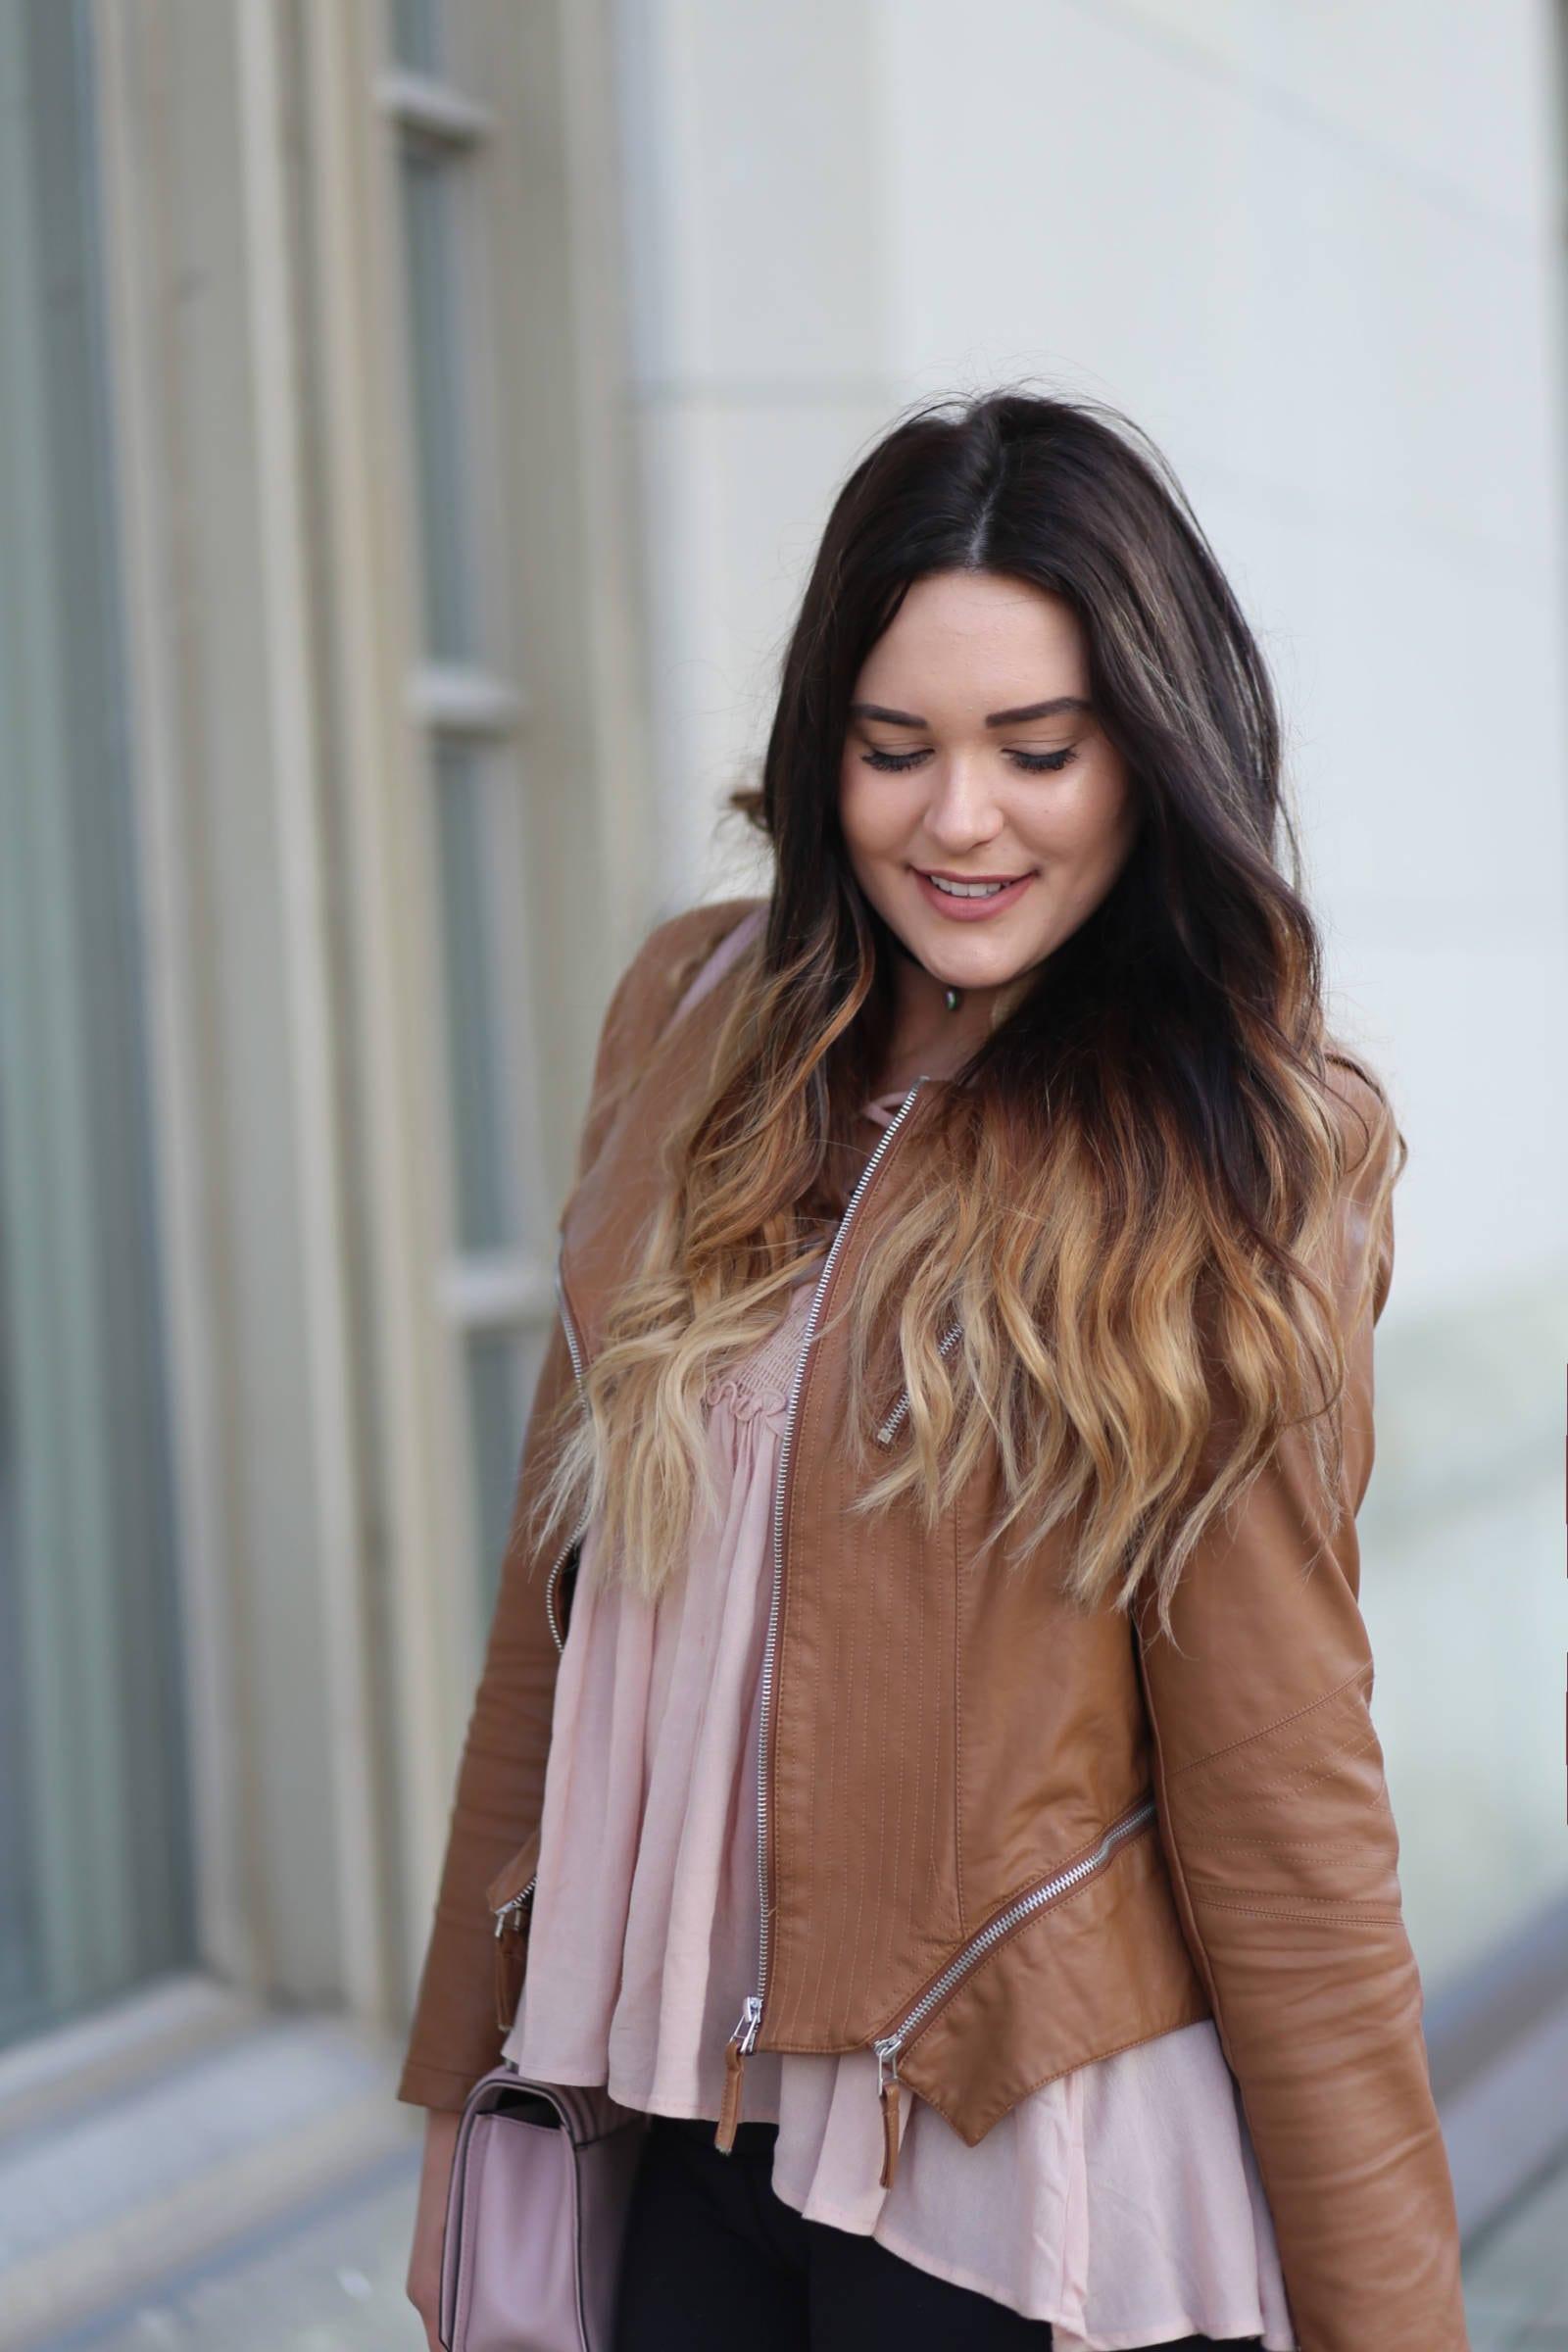 Mash elle faux leather jacket light brown pink shirt outfit | faux leather | beauty blogger Mash Elle